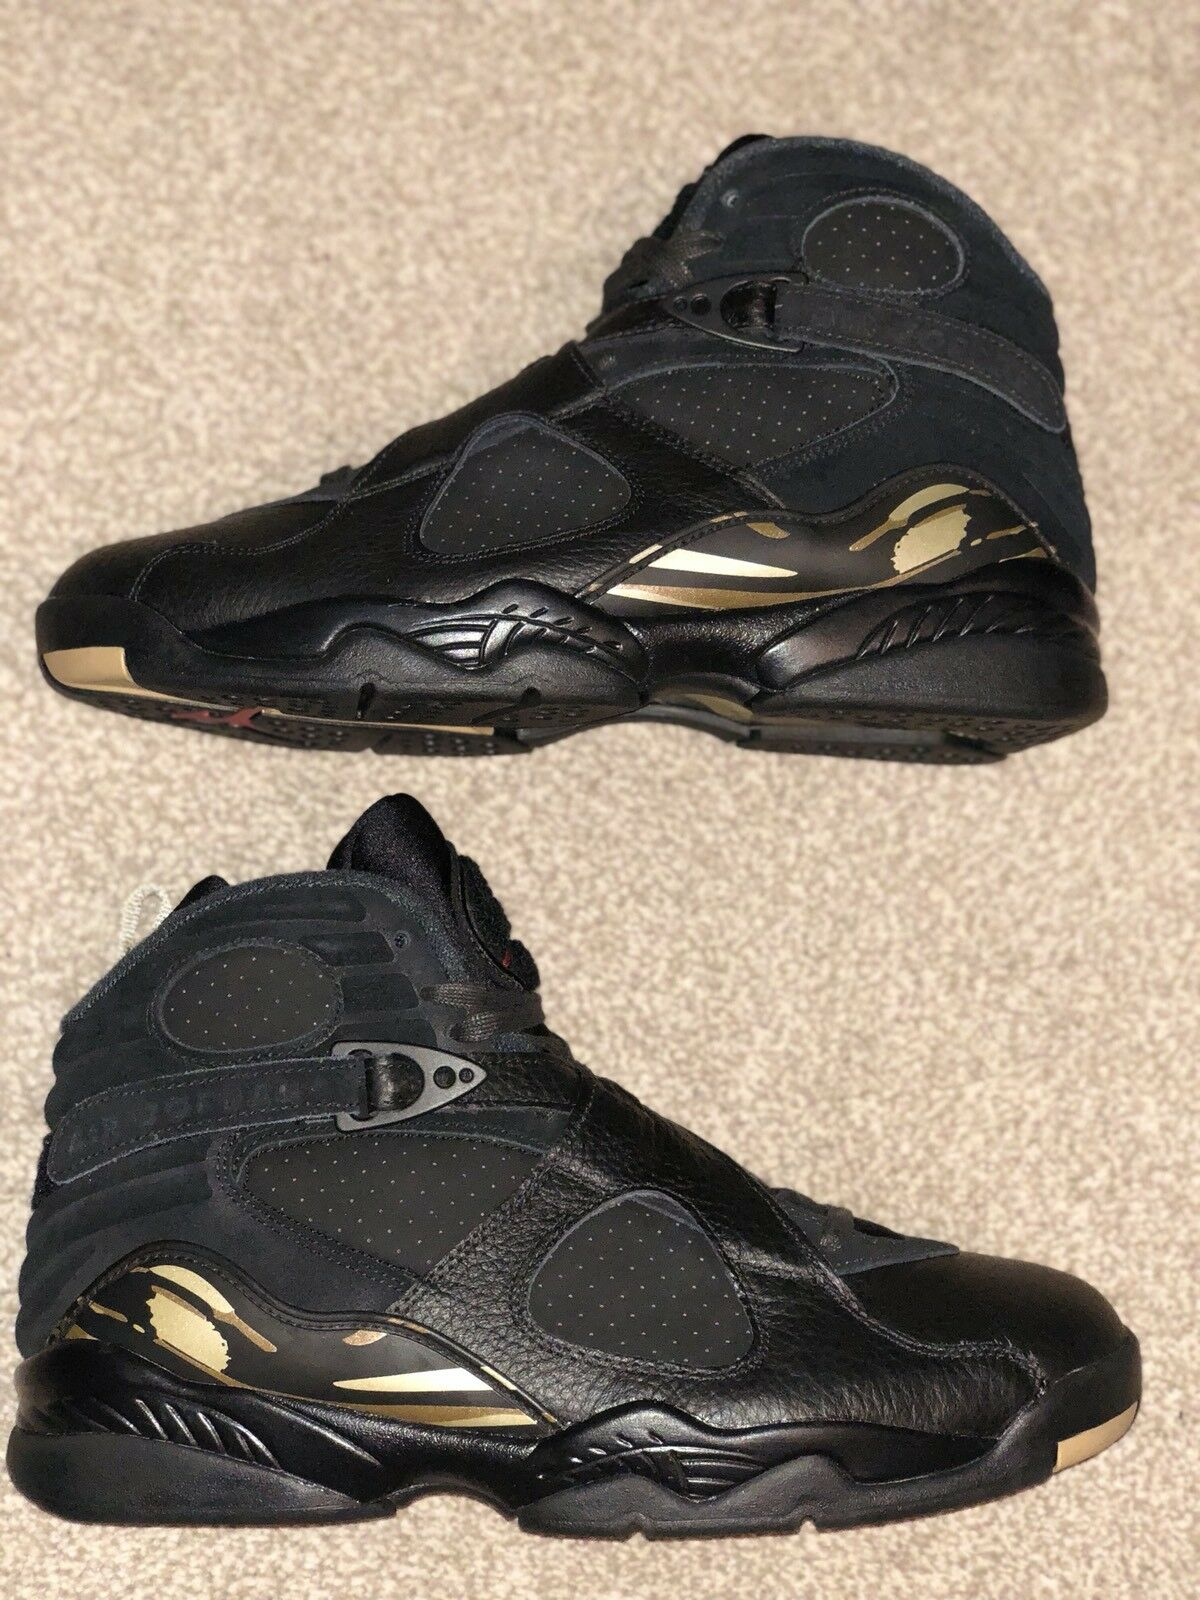 OVO x Jordan 8 Retrò Air Nike Nero Taglia UK9 US10 EU44 LOTTO